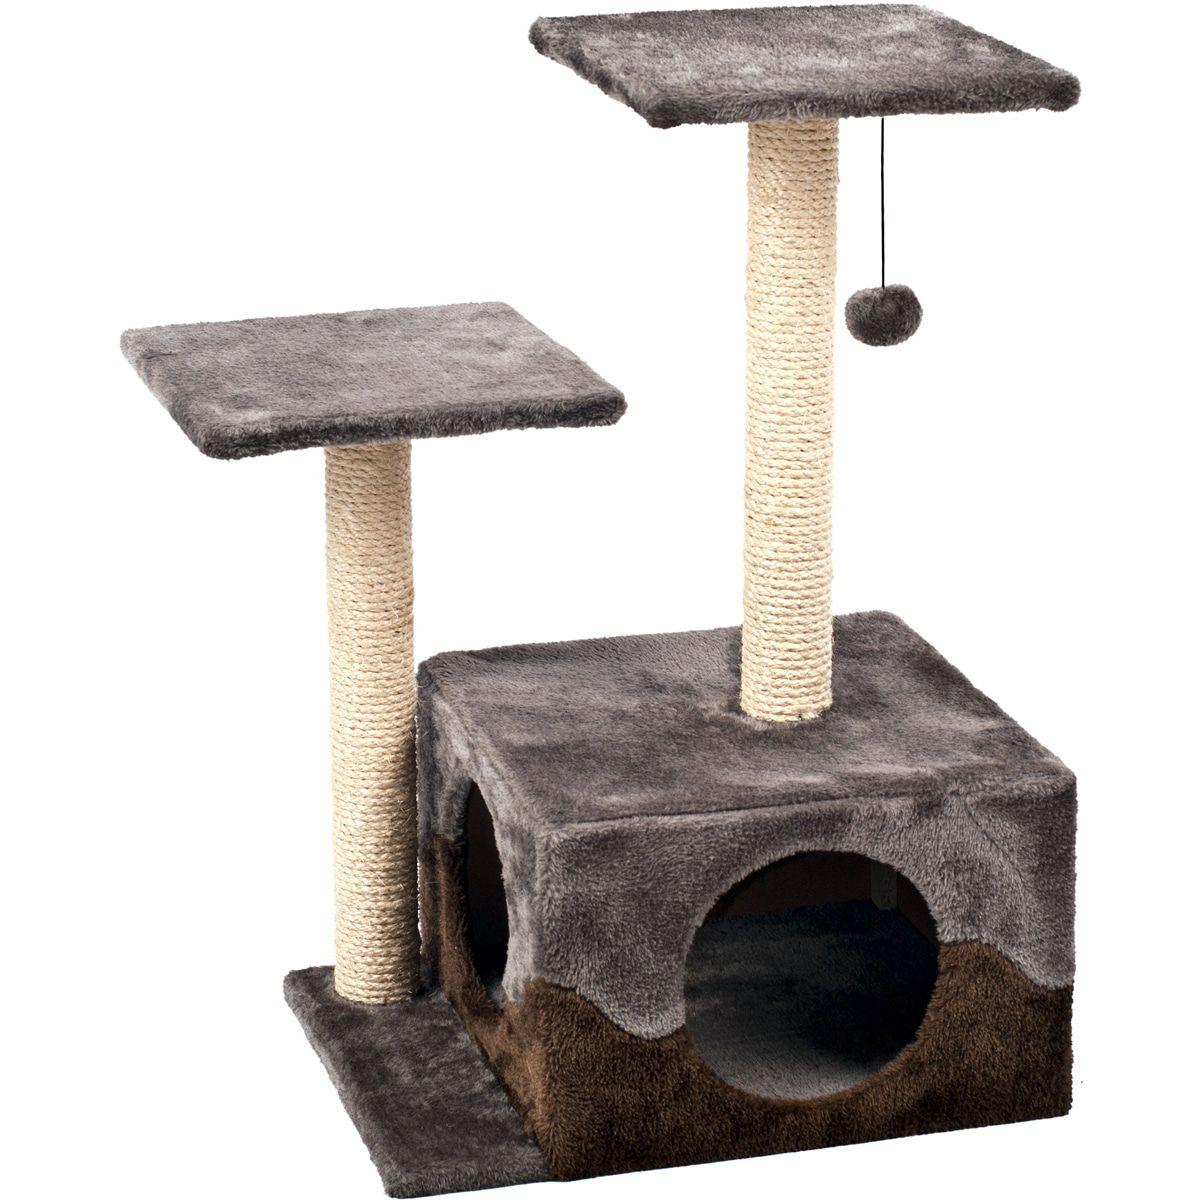 Krabpaal-Kangri-1-GrijsBruin-45-x-35-x-68-cm-Flamingo-Grijs